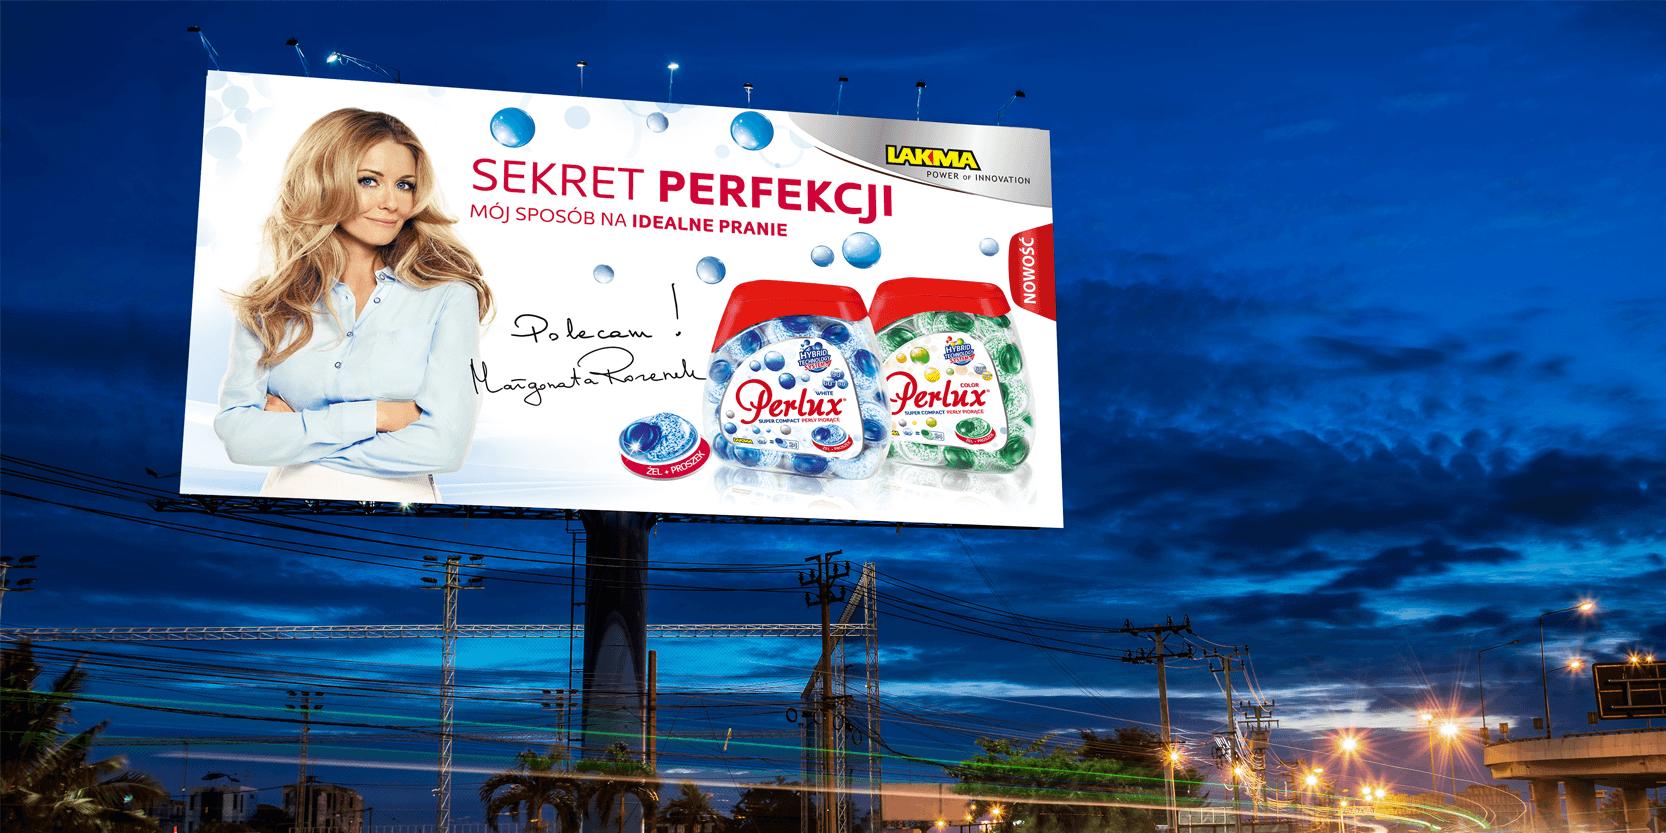 sekret perfekcji baner główny